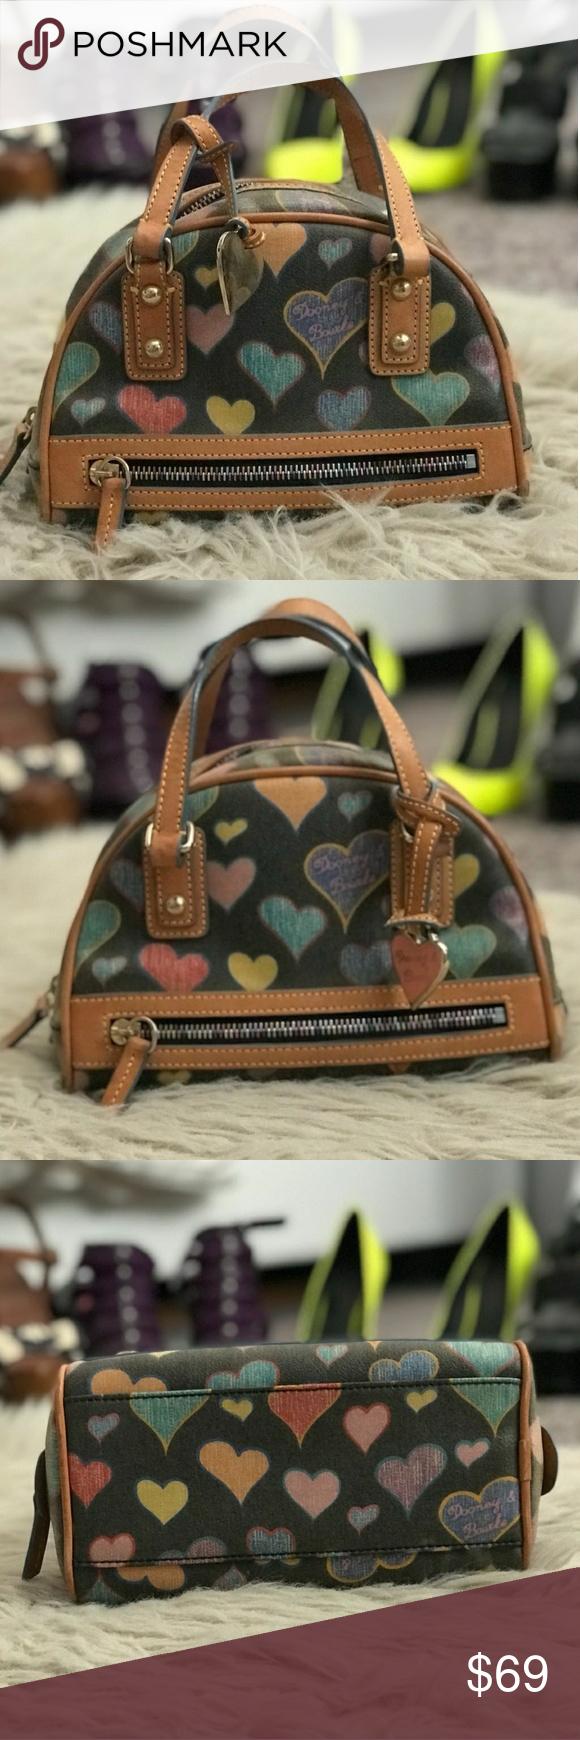 Dooney & Bourke Speedy Bag Cute on the go! This vintage